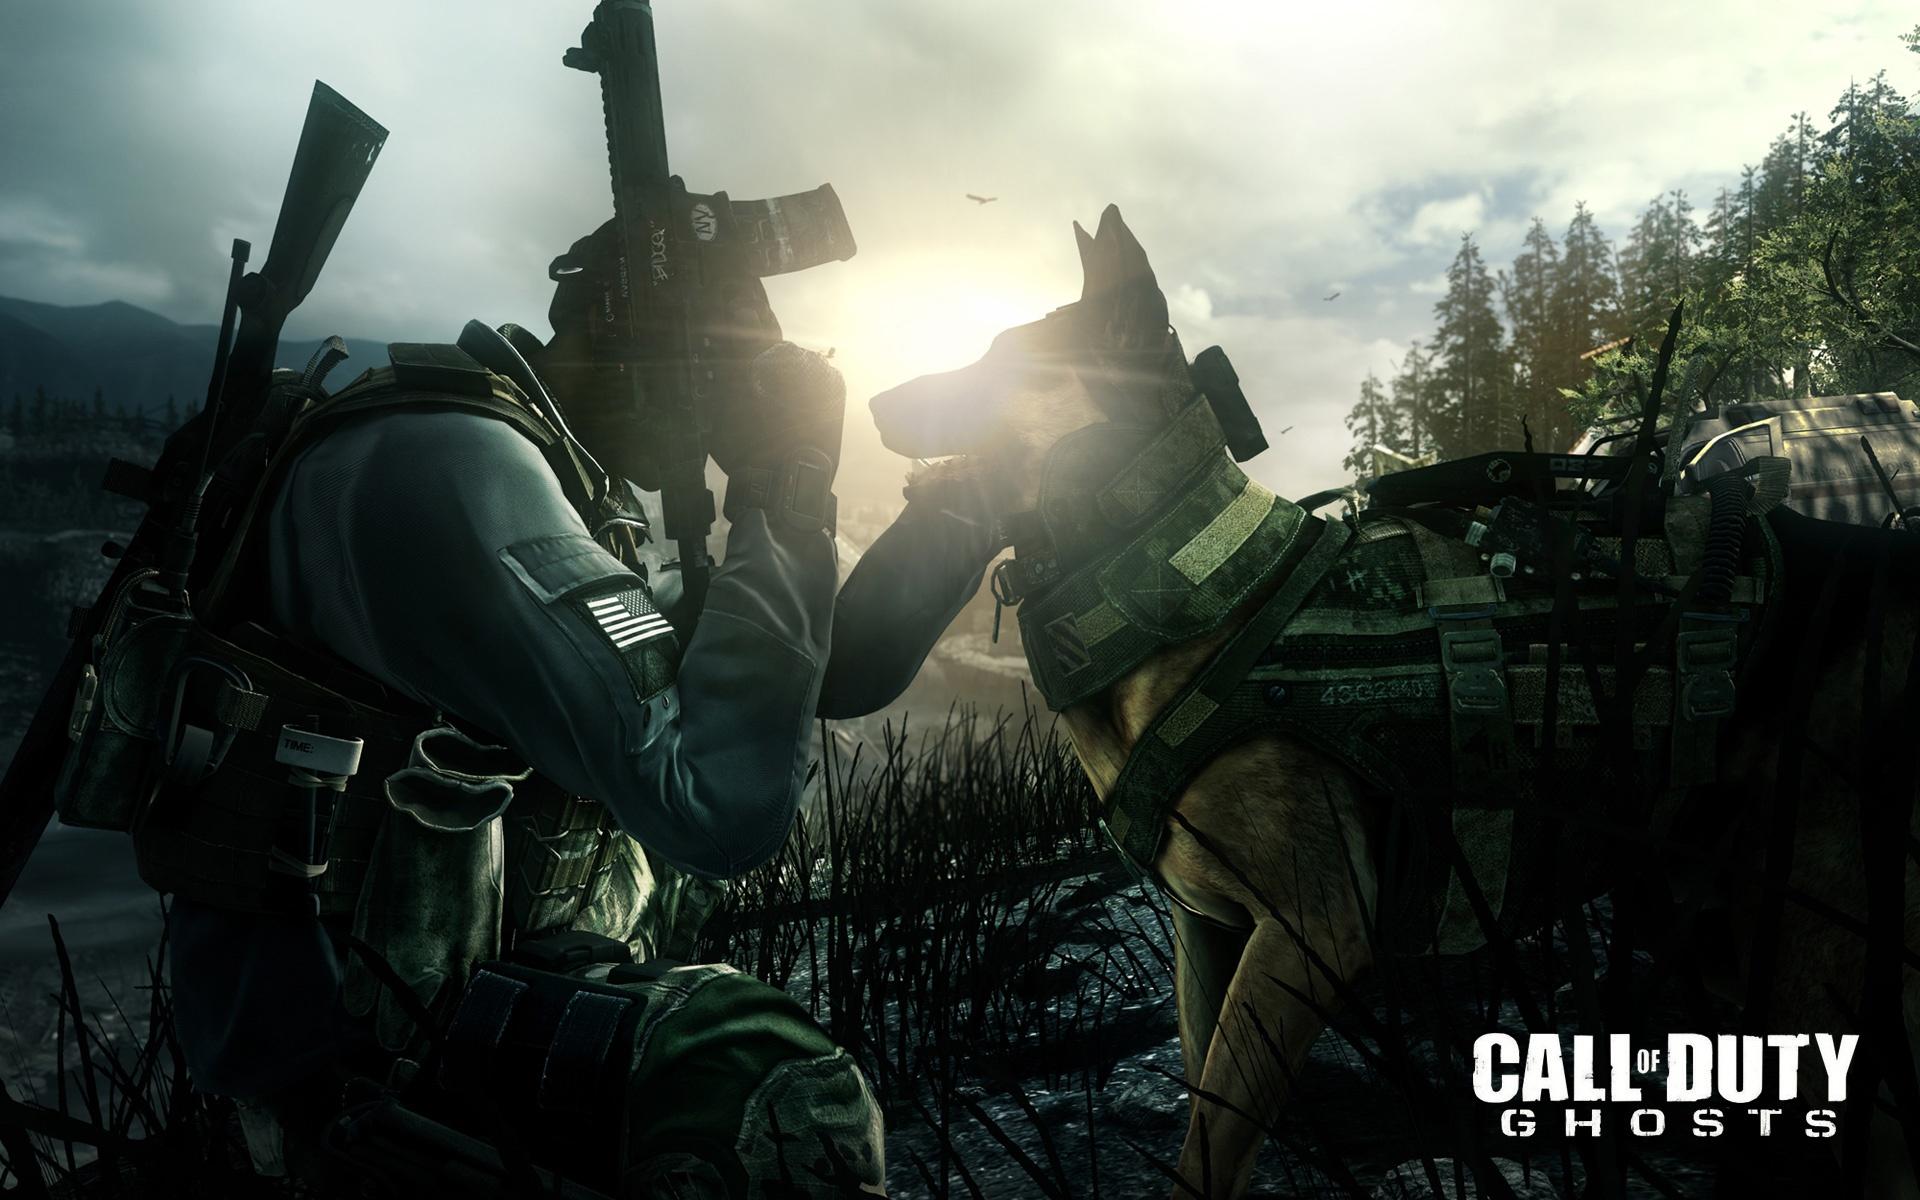 Papéis De Parede Call Of Duty: Ghosts HD 1920x1200 HD Imagem